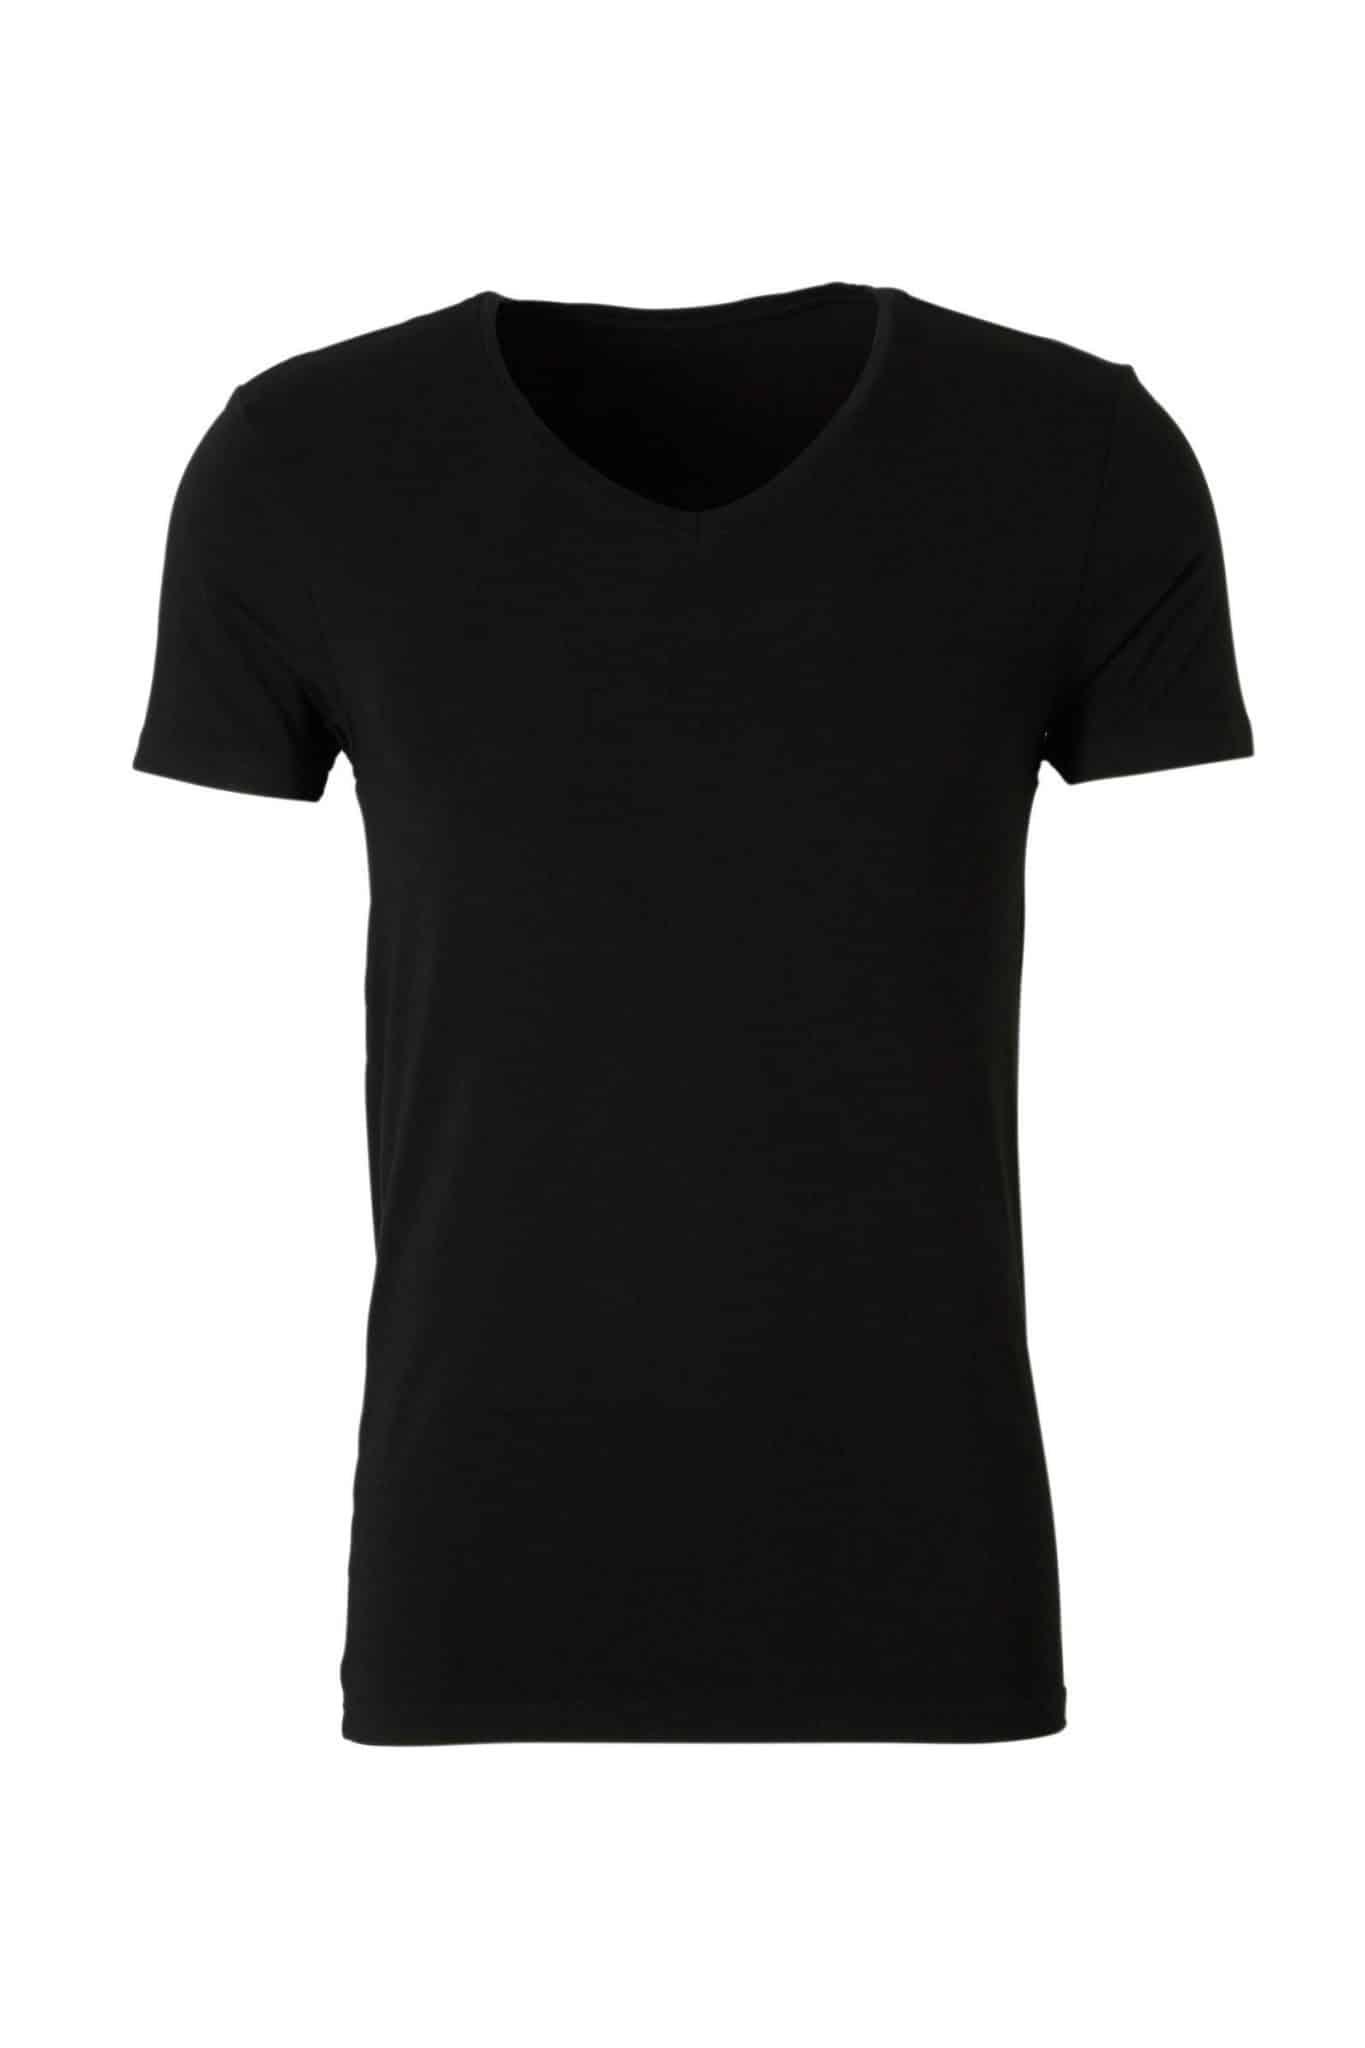 Zwart bamboe shirt van Ten Cate